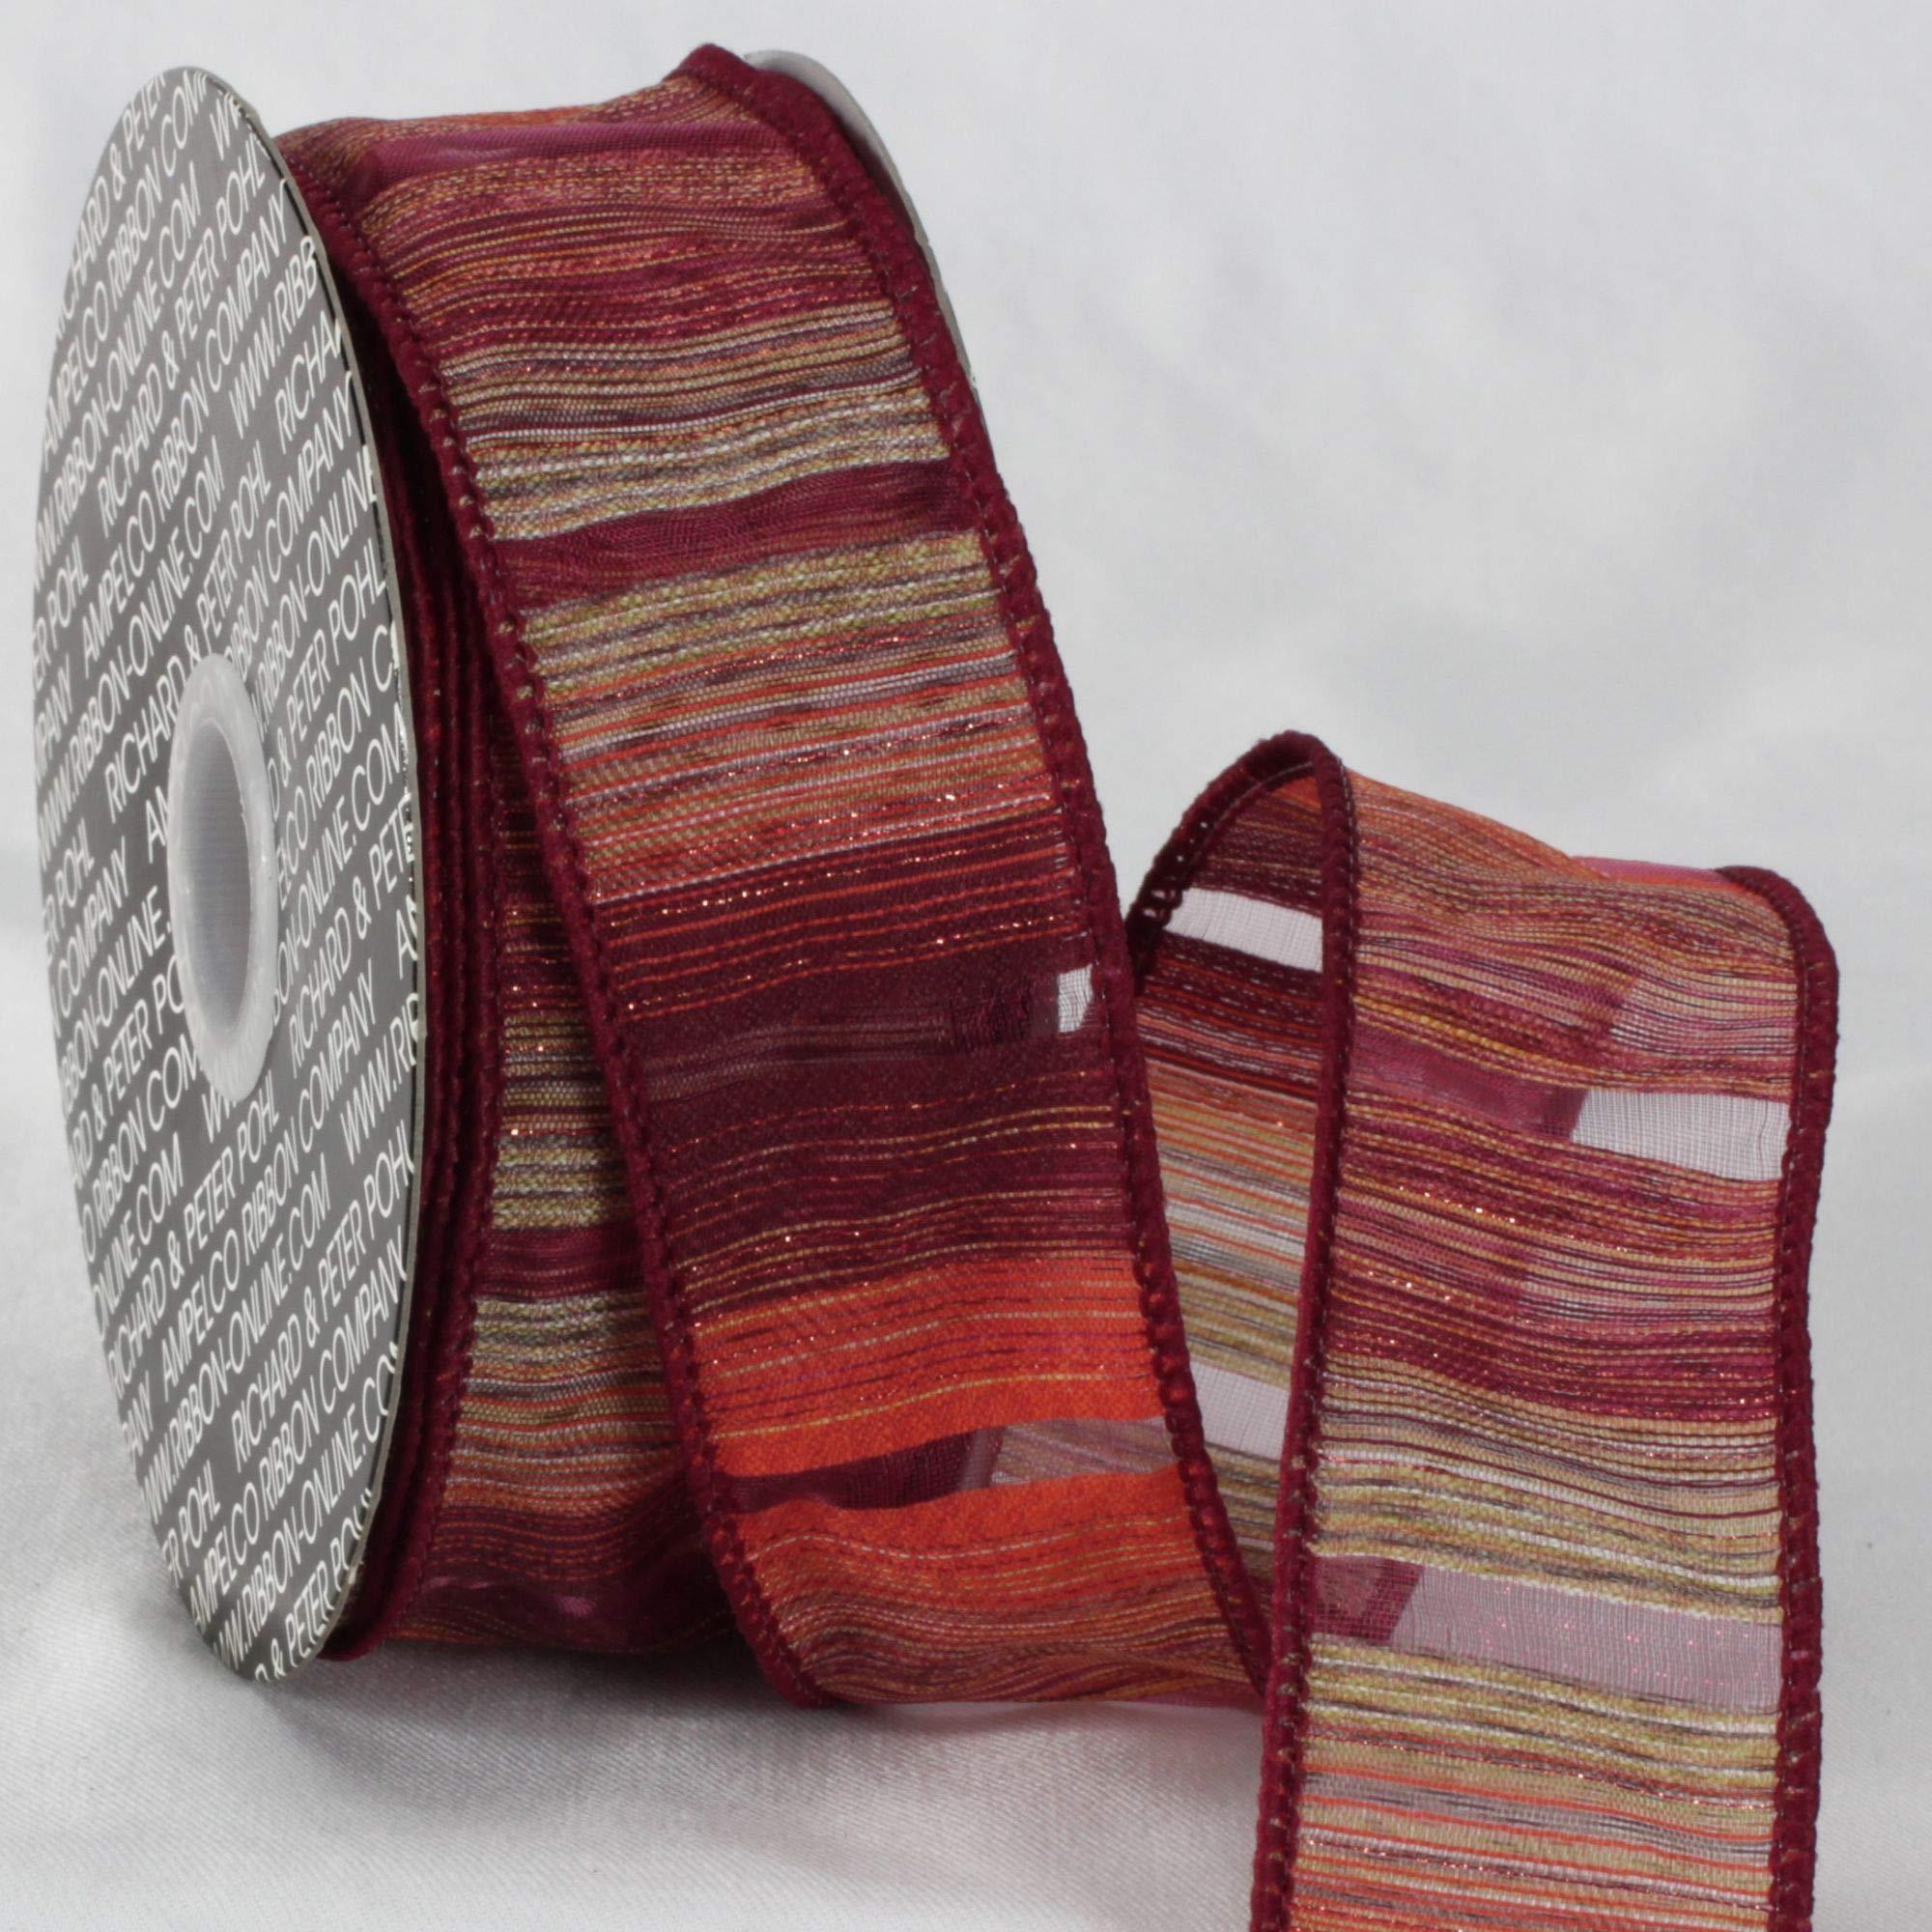 Amazon Com Red And Gray Diagonal Stripe Wired Edge Craft Ribbon 1 5 X 20 Yards Furniture Decor